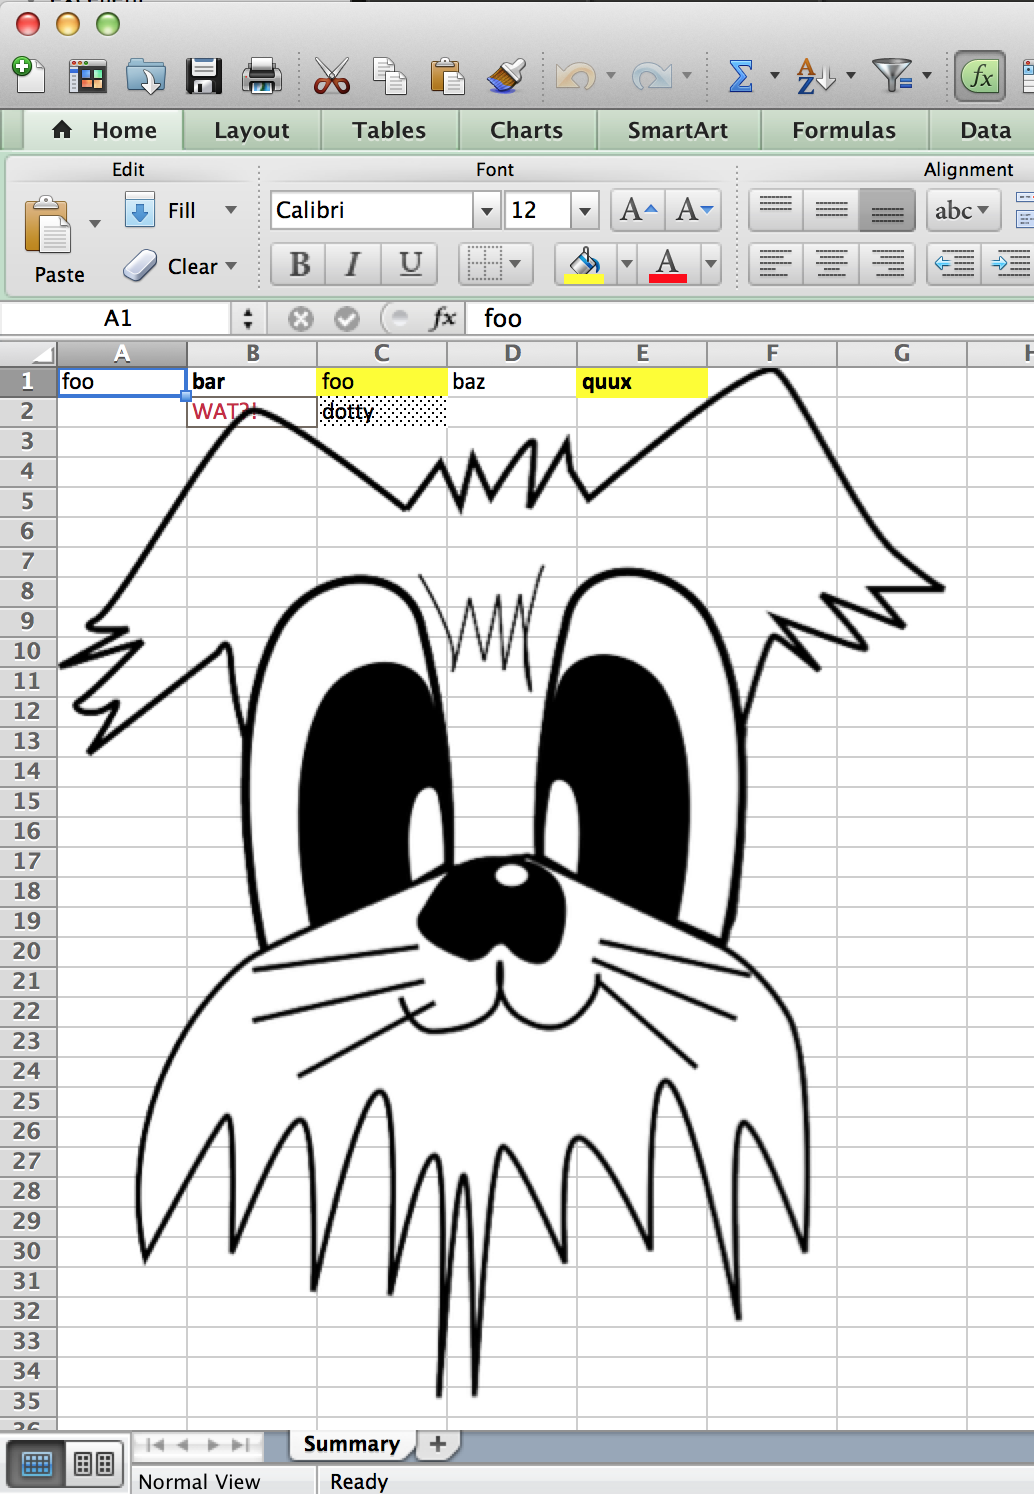 image of generated spreadsheet